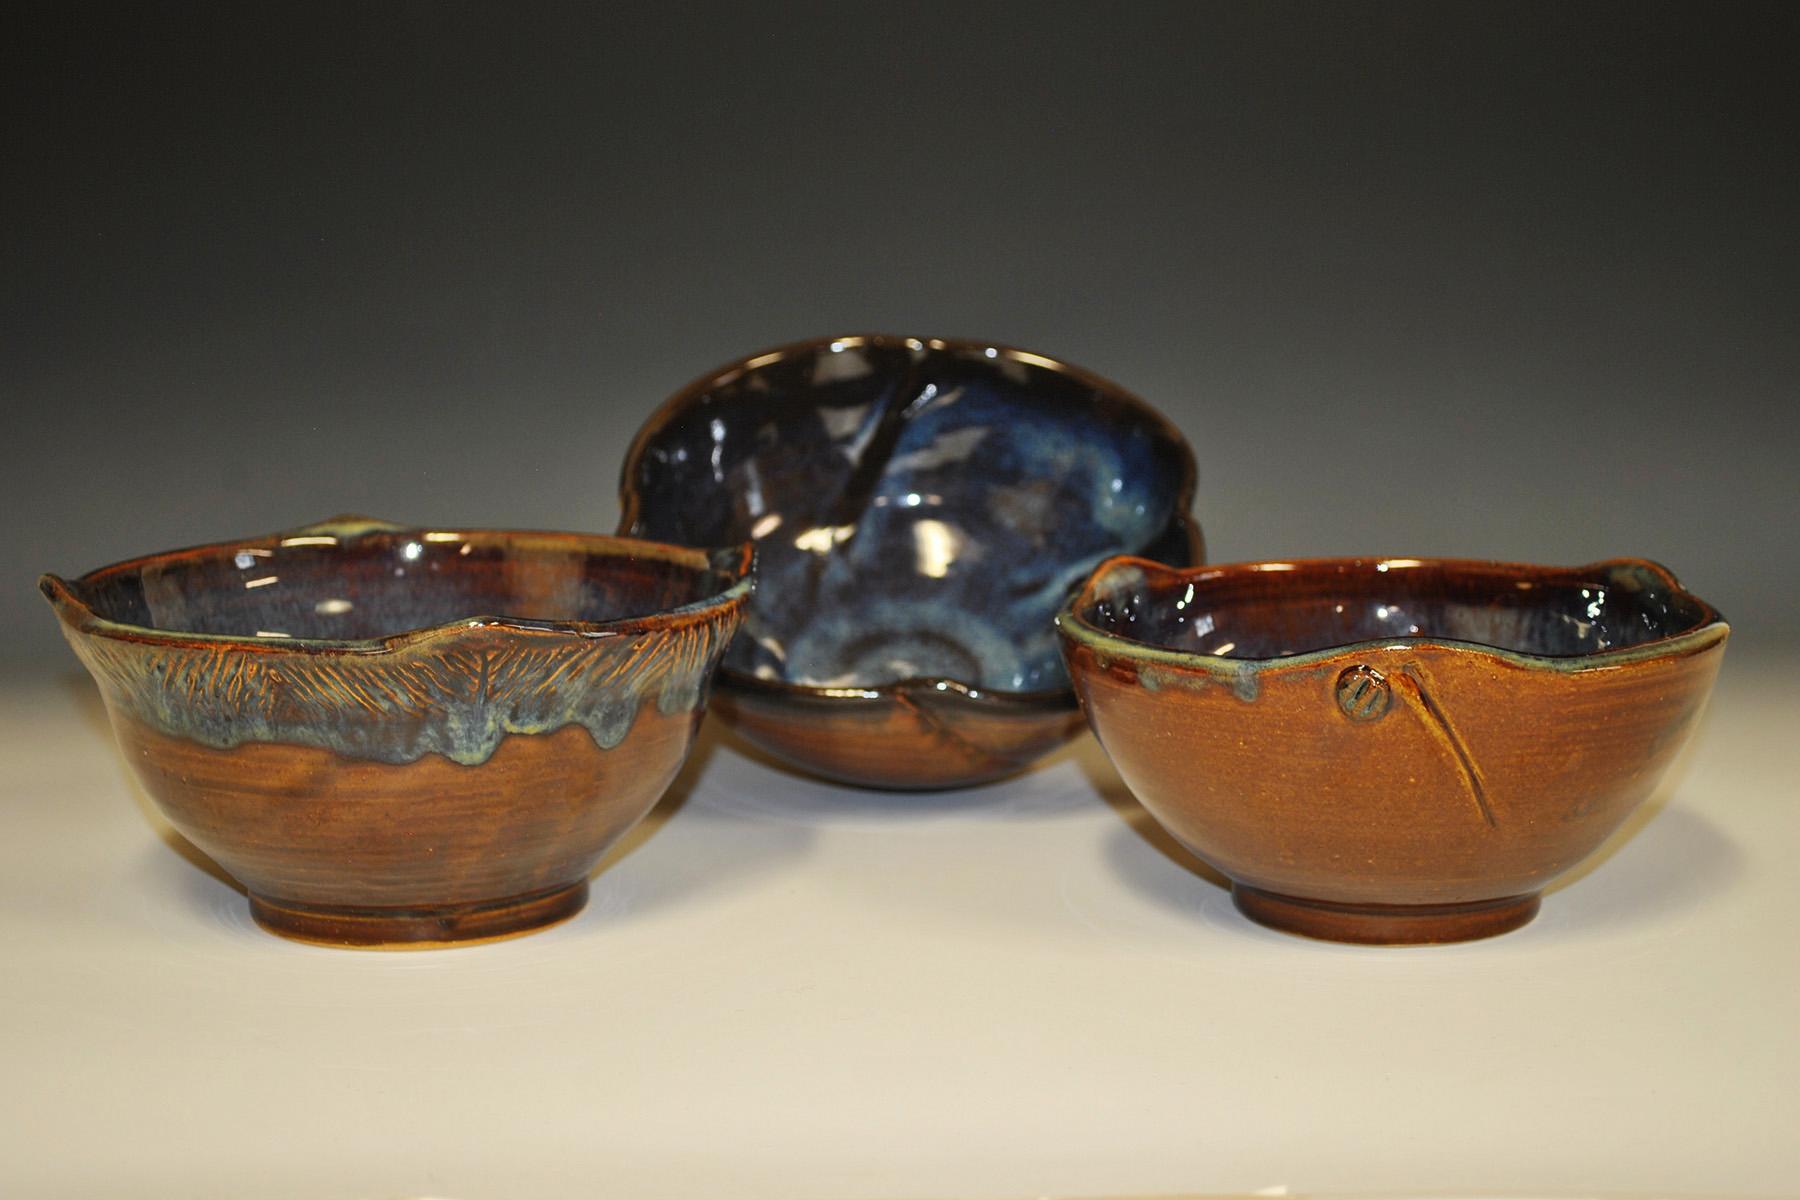 15 speckled bowls